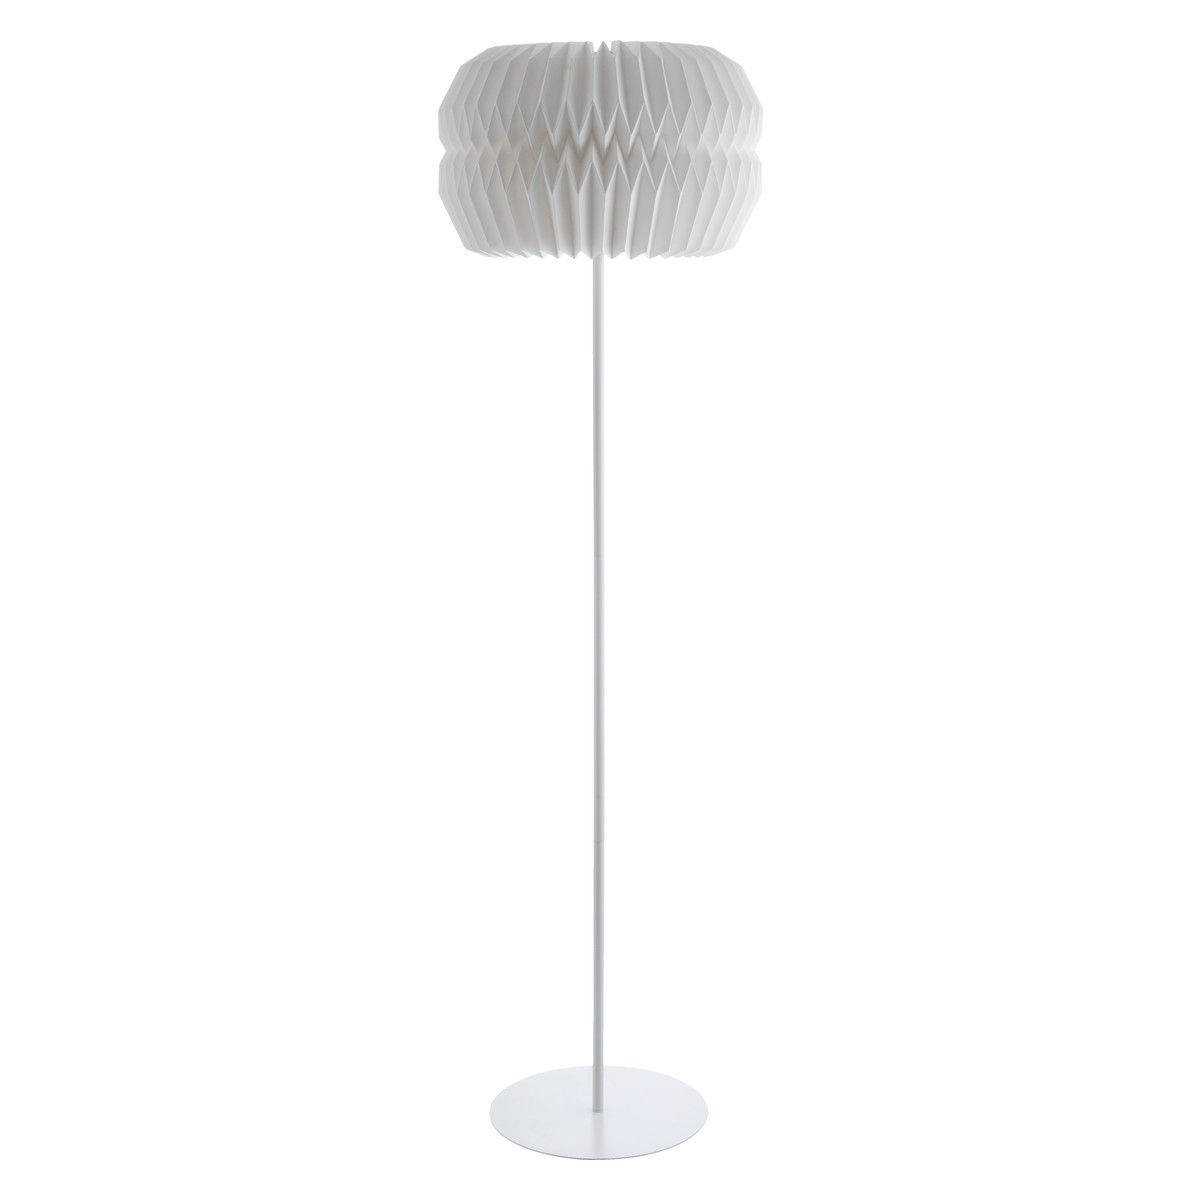 Habitat | Floor lamp, Metals and Living room shop